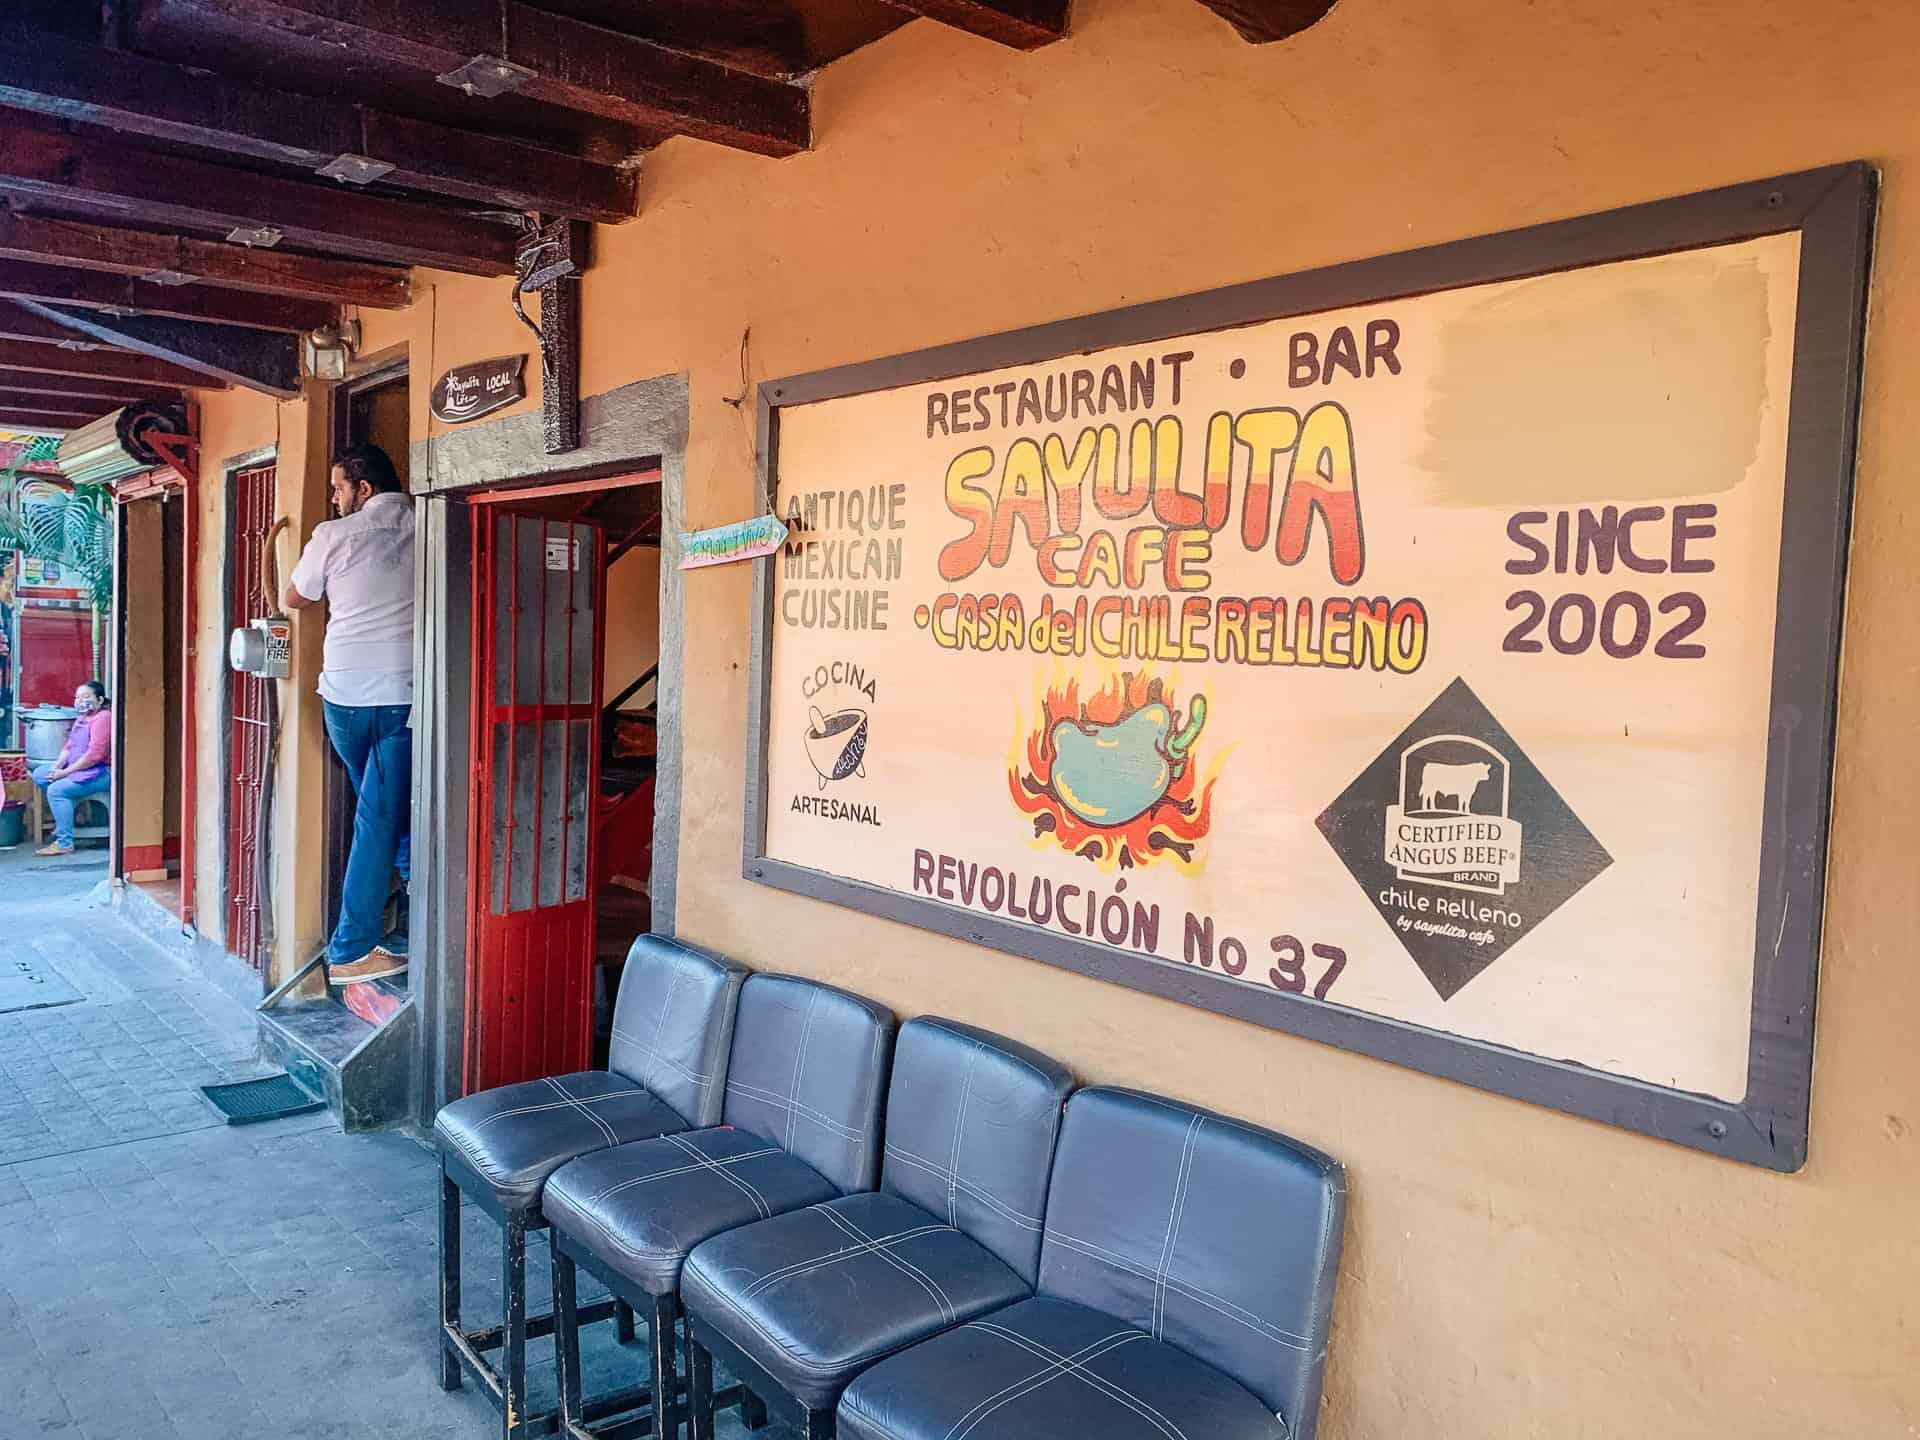 restaurants in sayulita, sayulita restaurants, best restaurants in sayulita, best restaurant in sayulita, restaurants sayulita